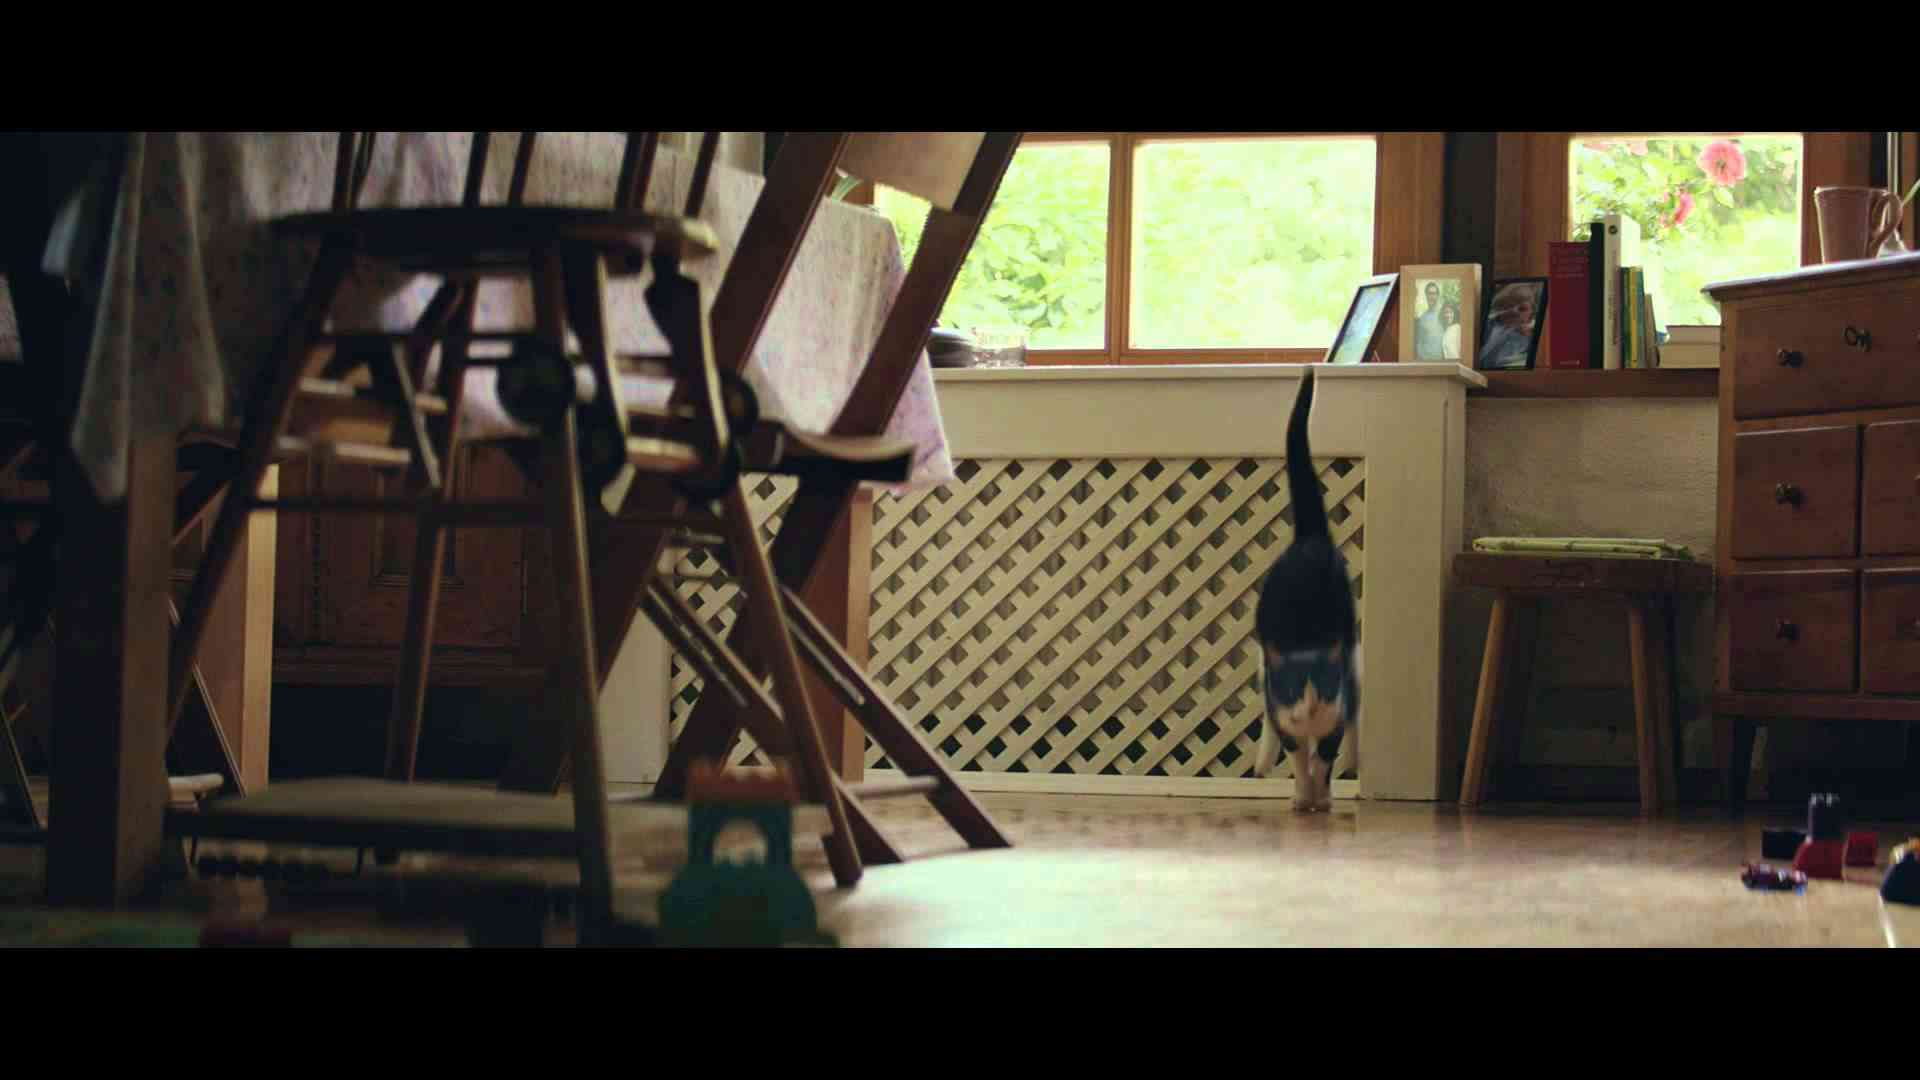 YKK AP CM 赤ちゃんと猫篇 60秒 - YouTube